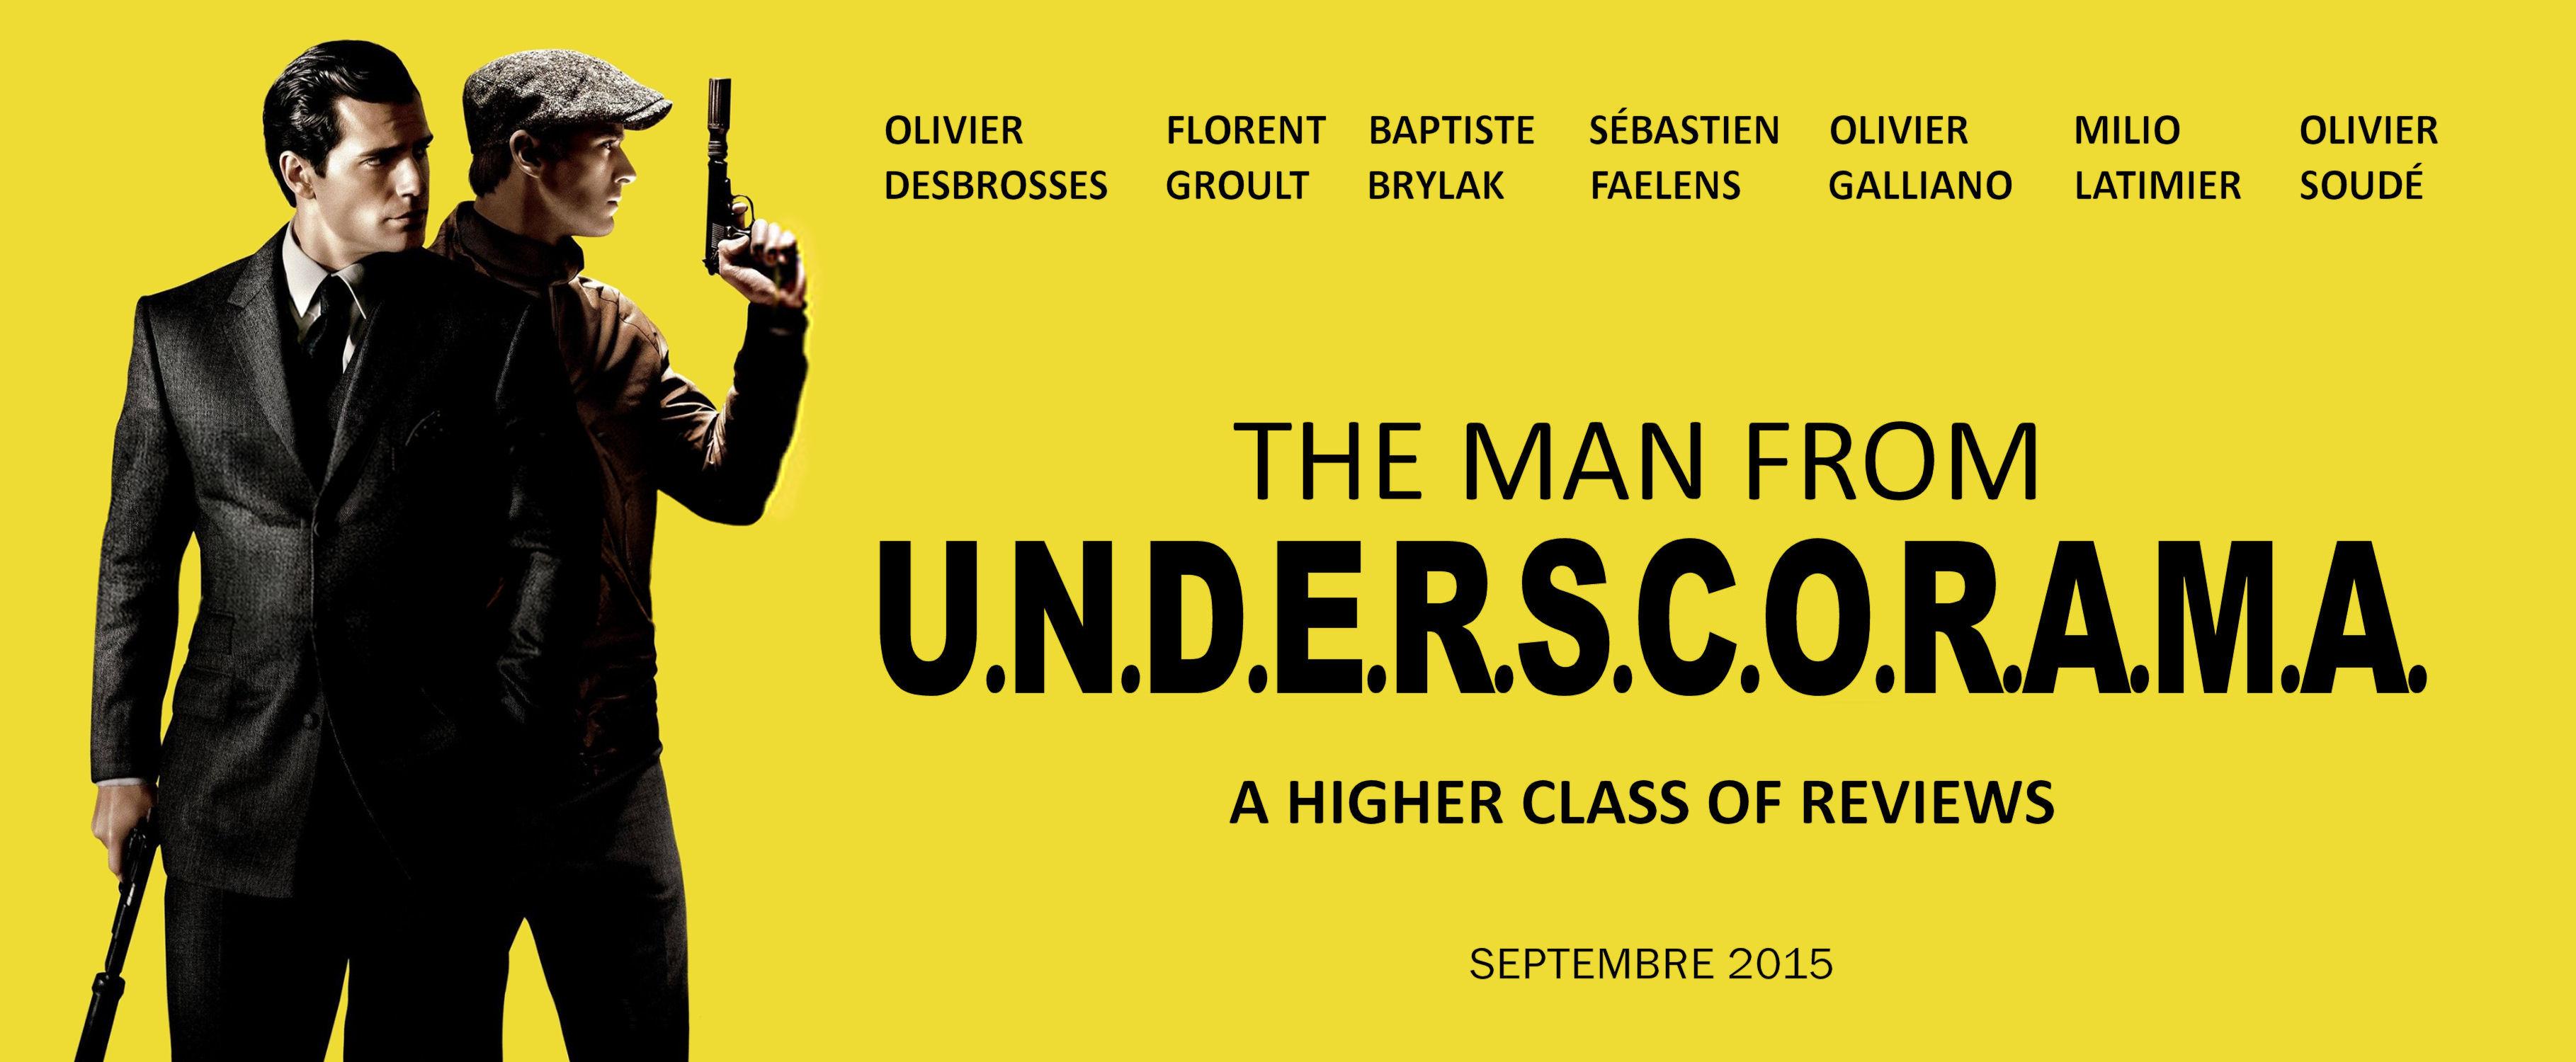 Slide-UnderScorama-09.2015